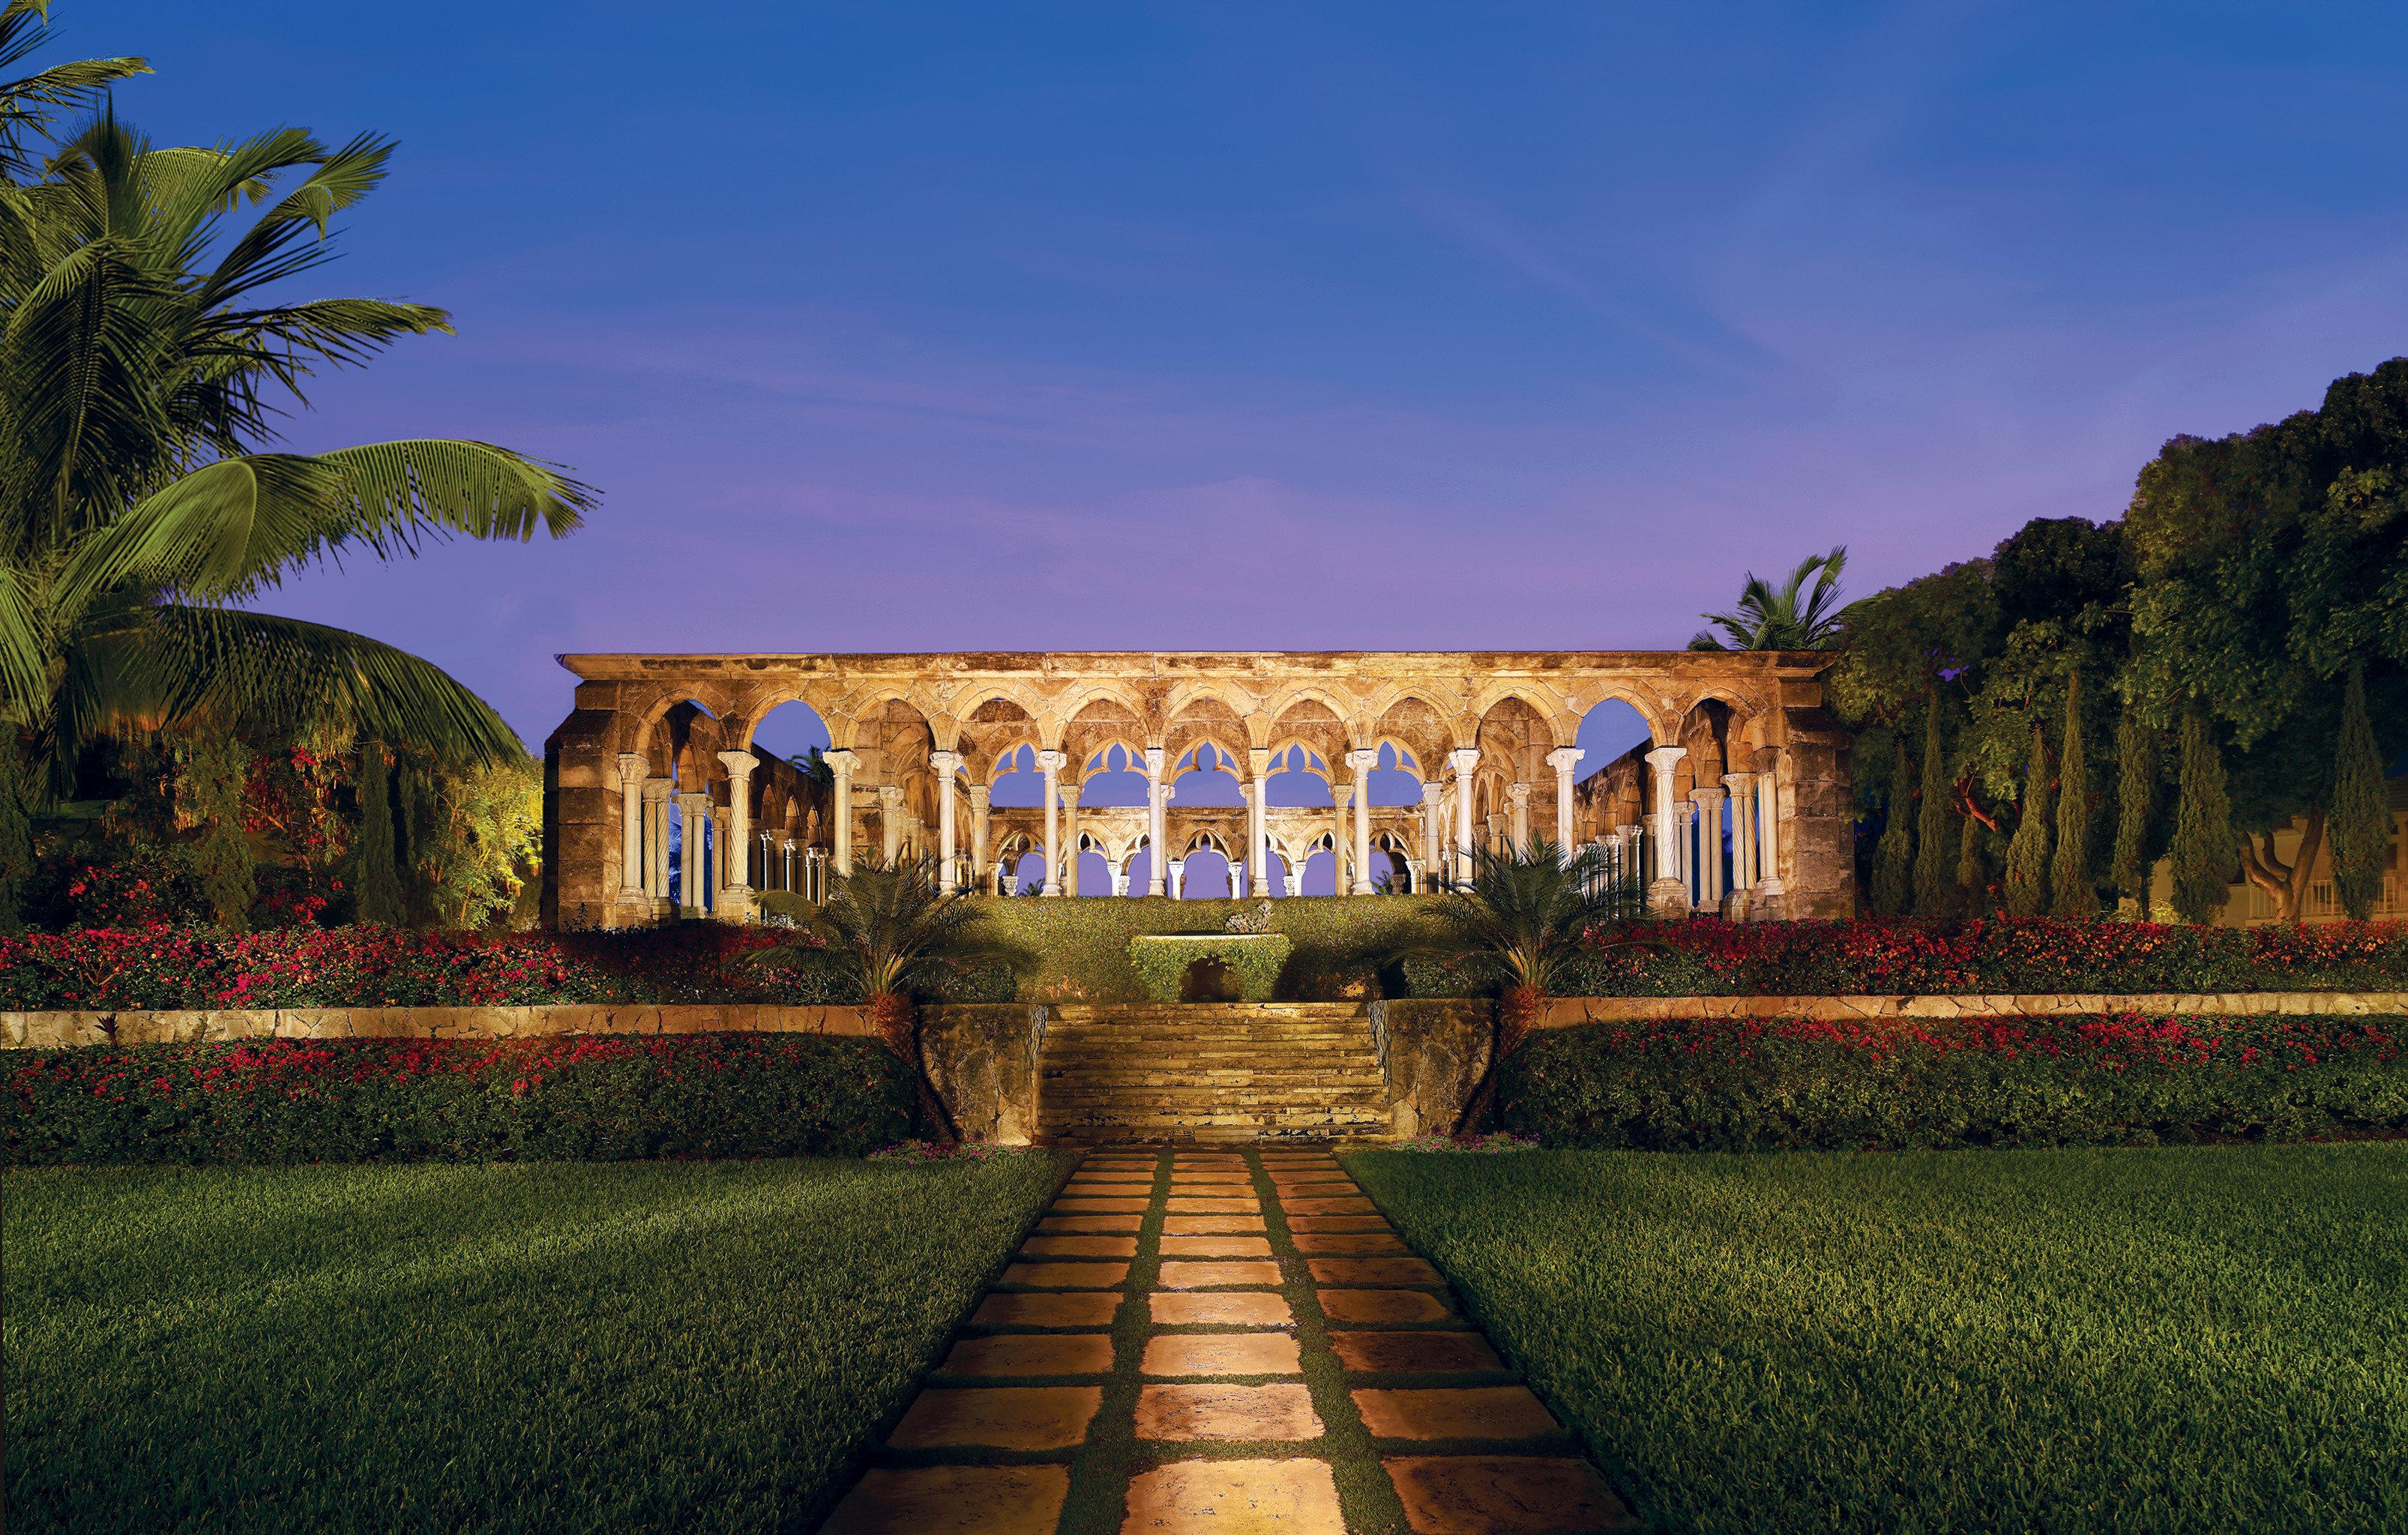 Family Grounds grass sky landmark evening palace mansion stone